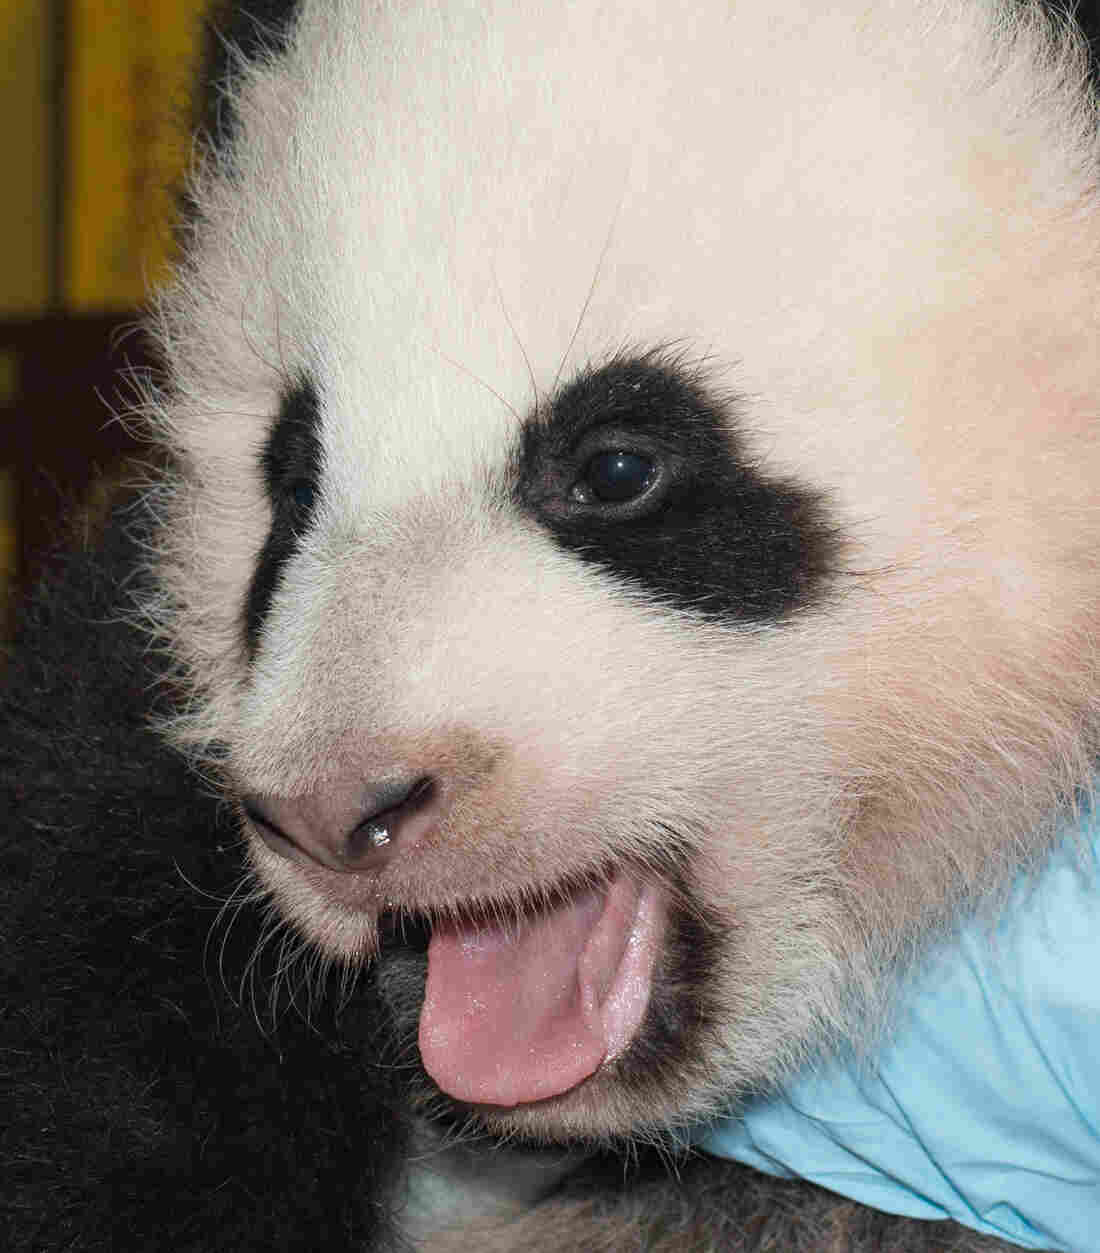 Bao Bao, the Smithsonian's giant panda cub, on Nov. 29.